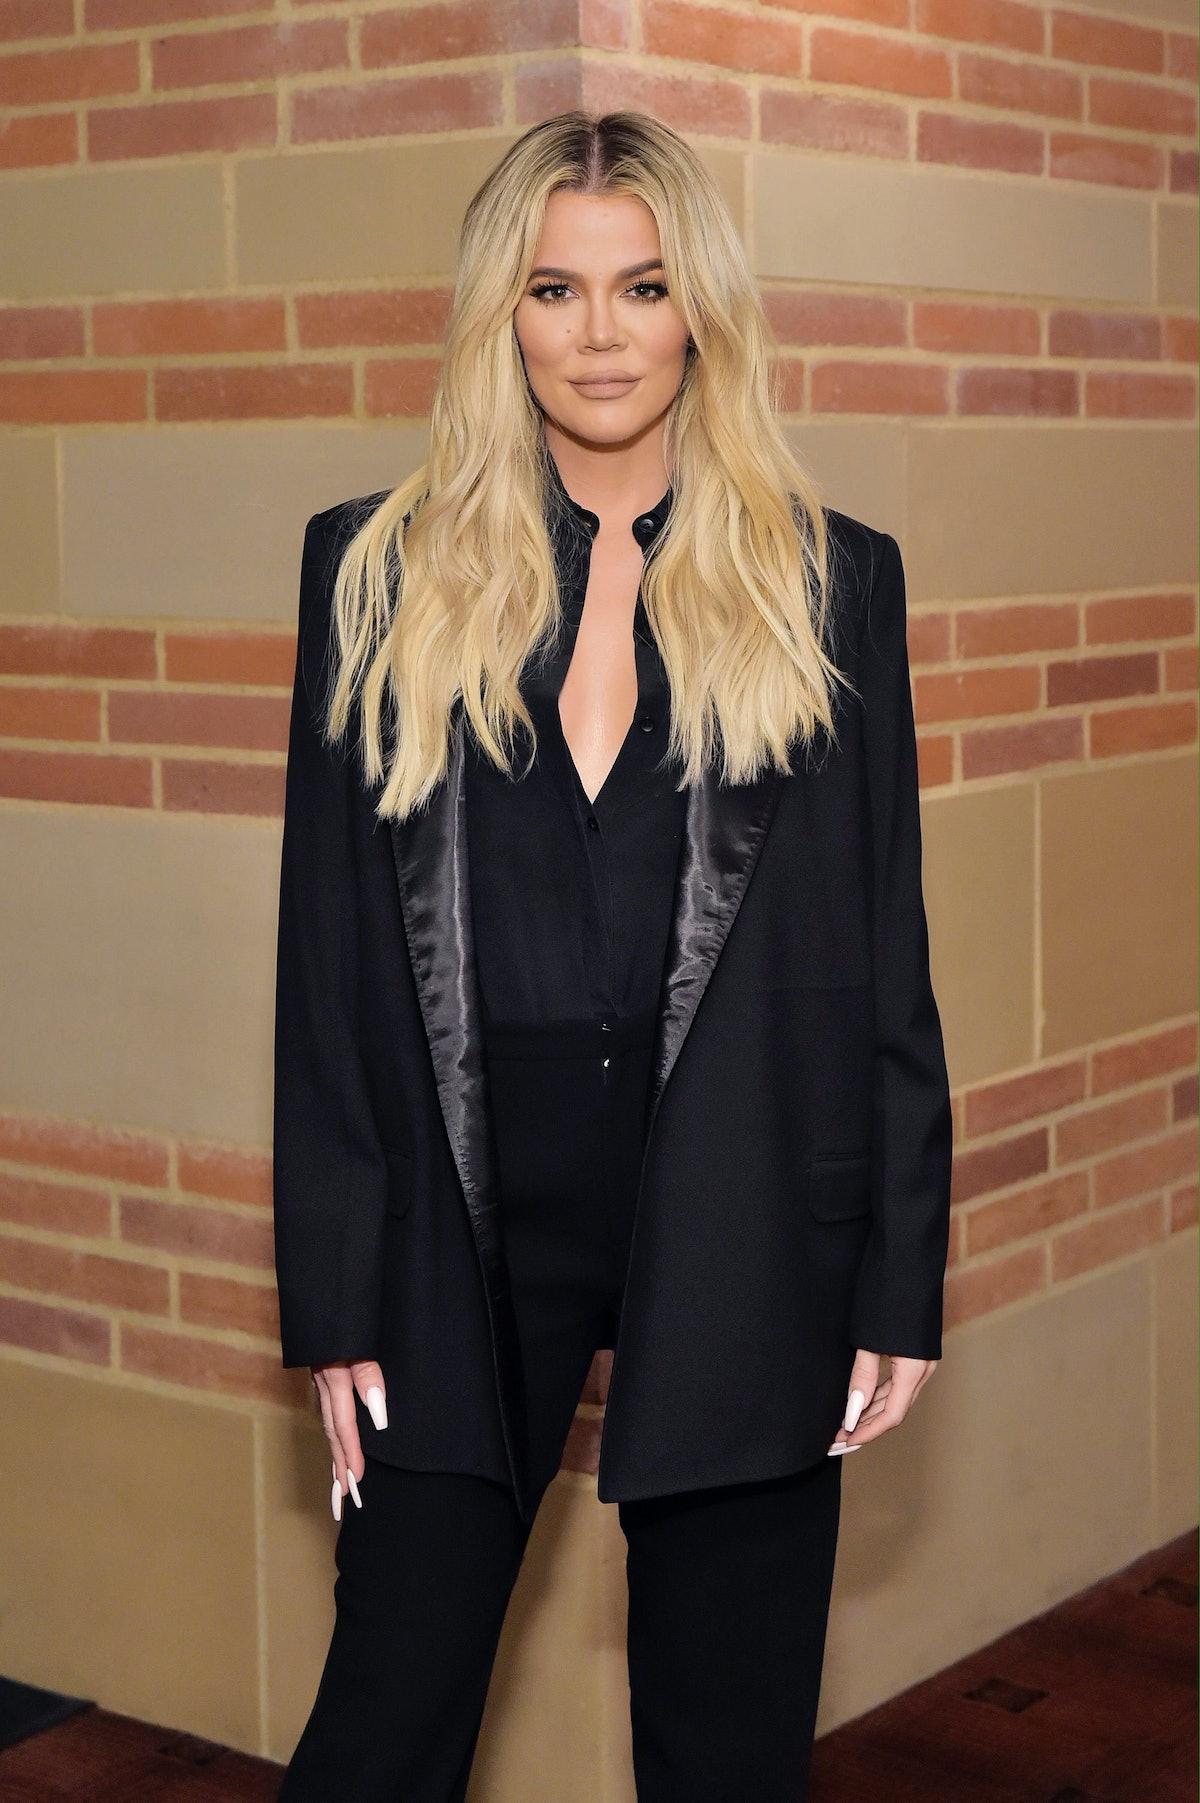 LOS ANGELES, CALIFORNIA - NOVEMBER 19: Khloe Kardashian attends The Promise Armenian Institute Event...